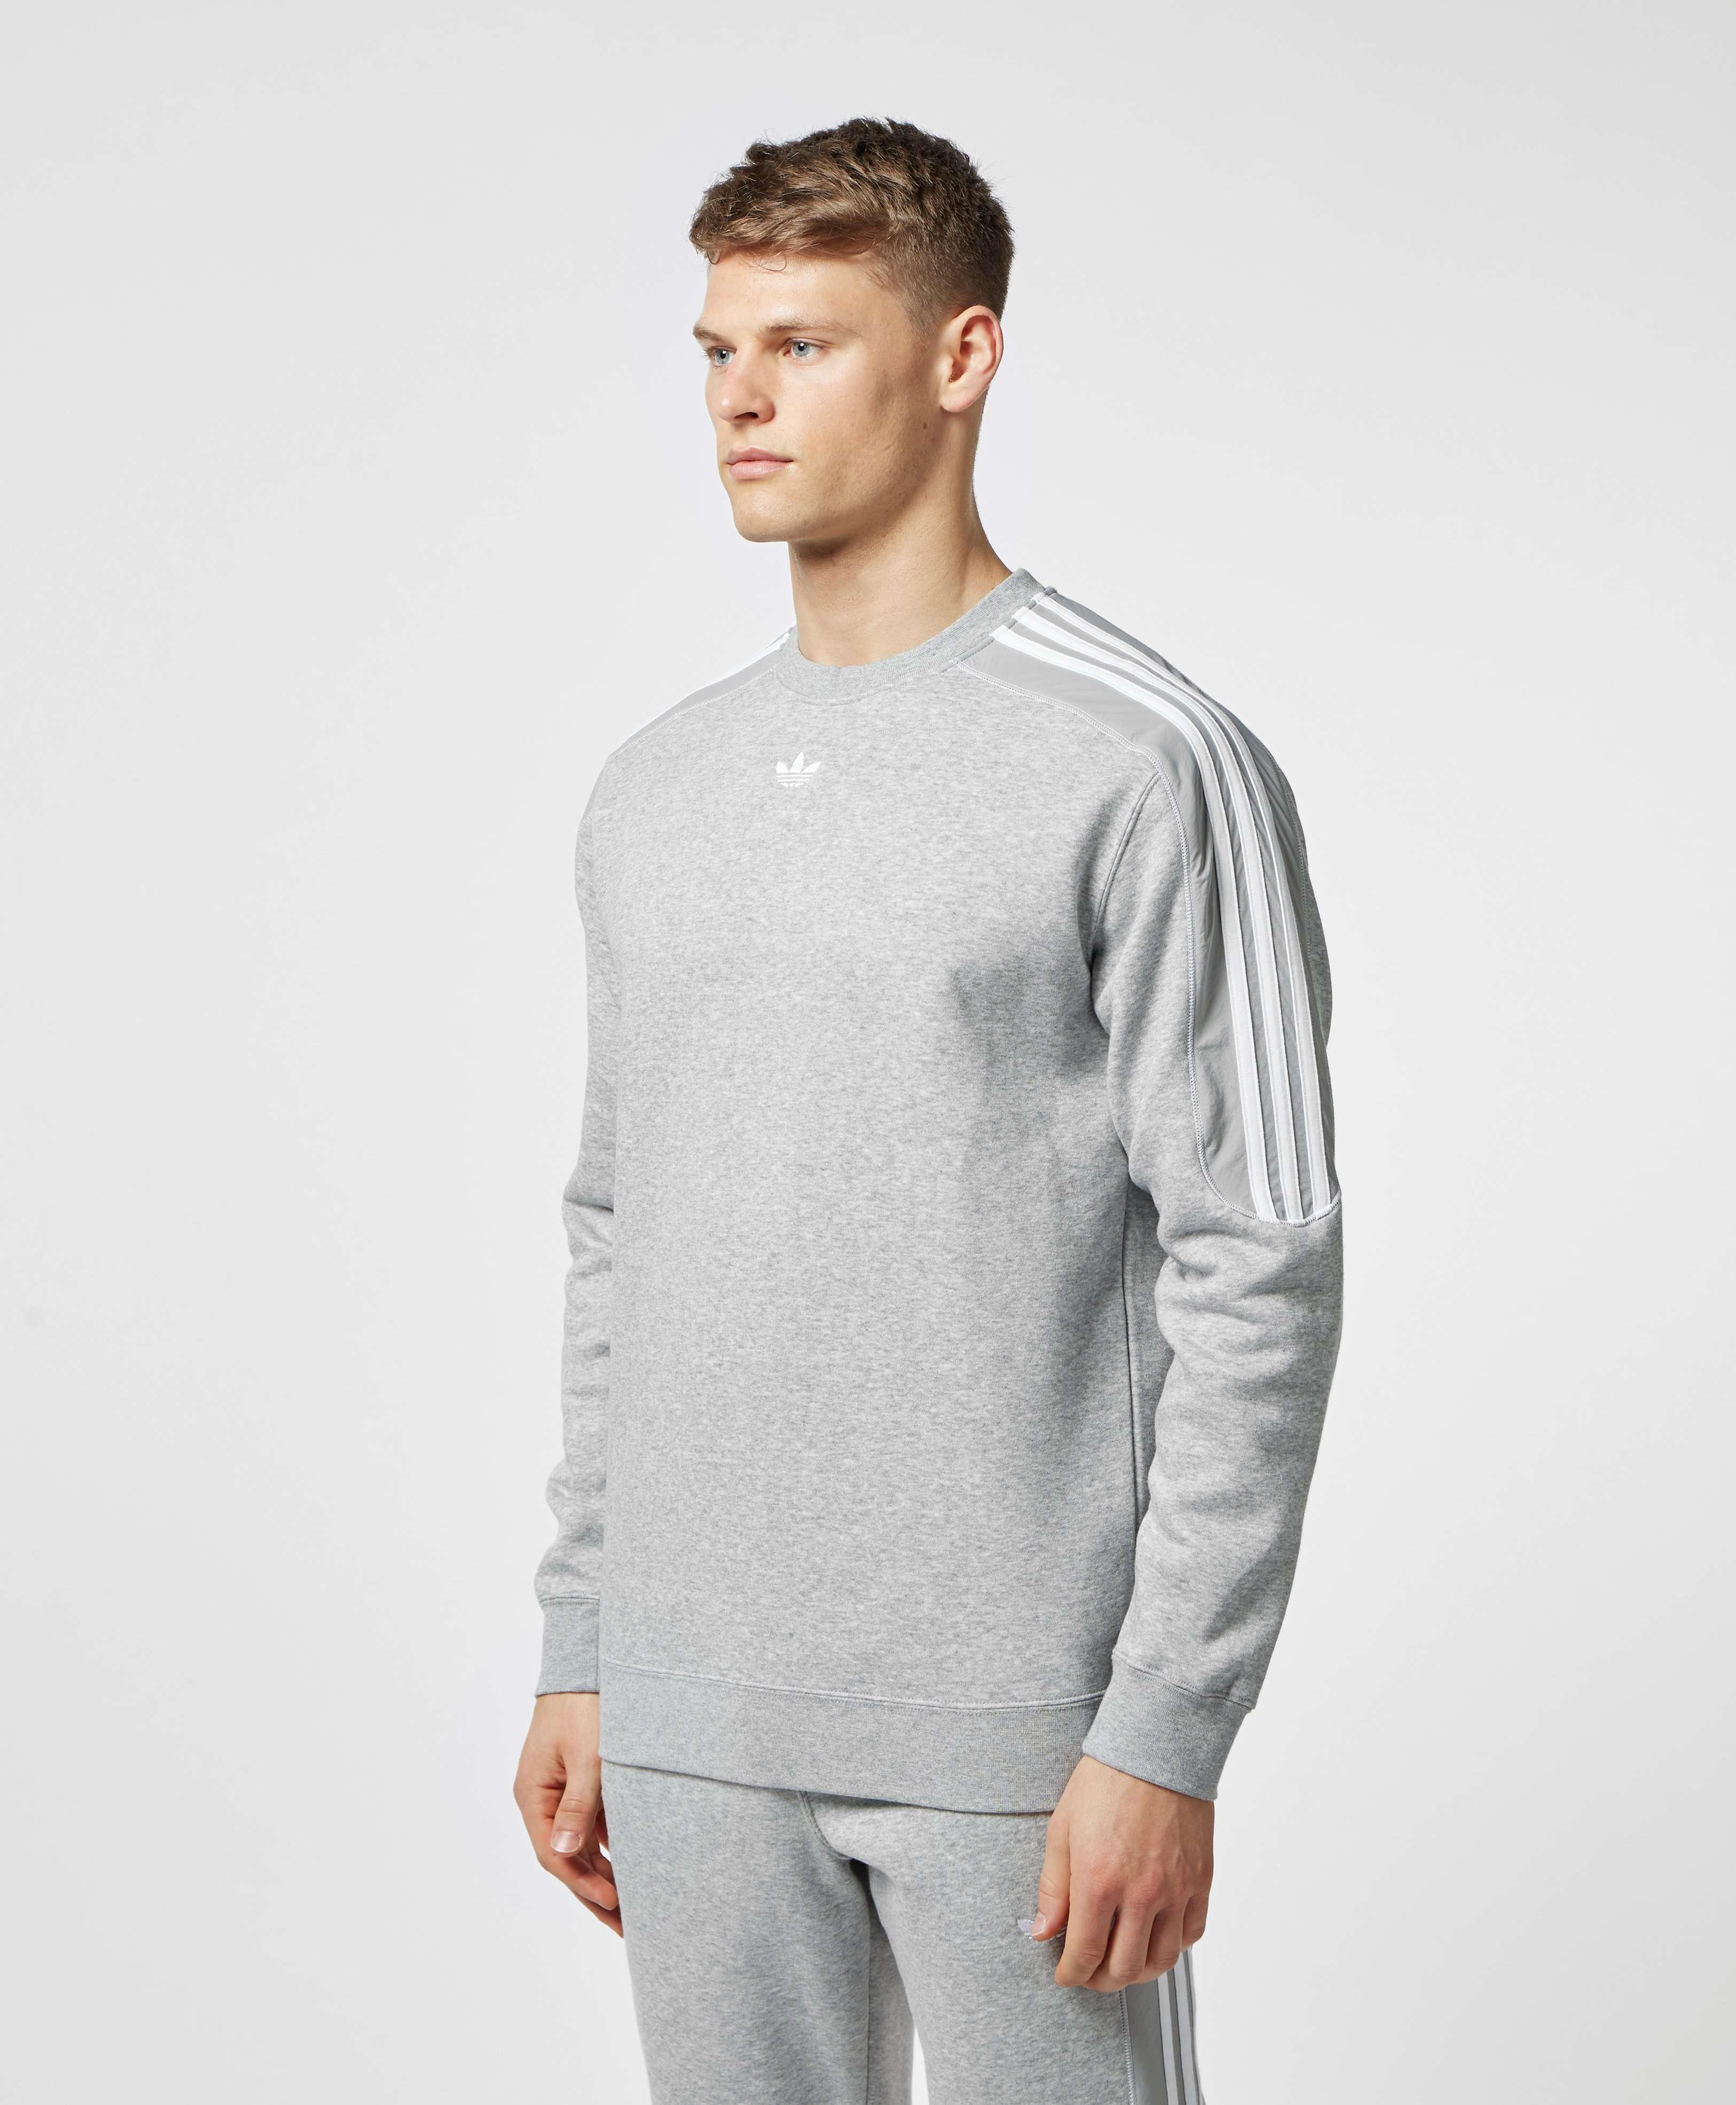 adidas Originals Spirit Crew Sweatshirt